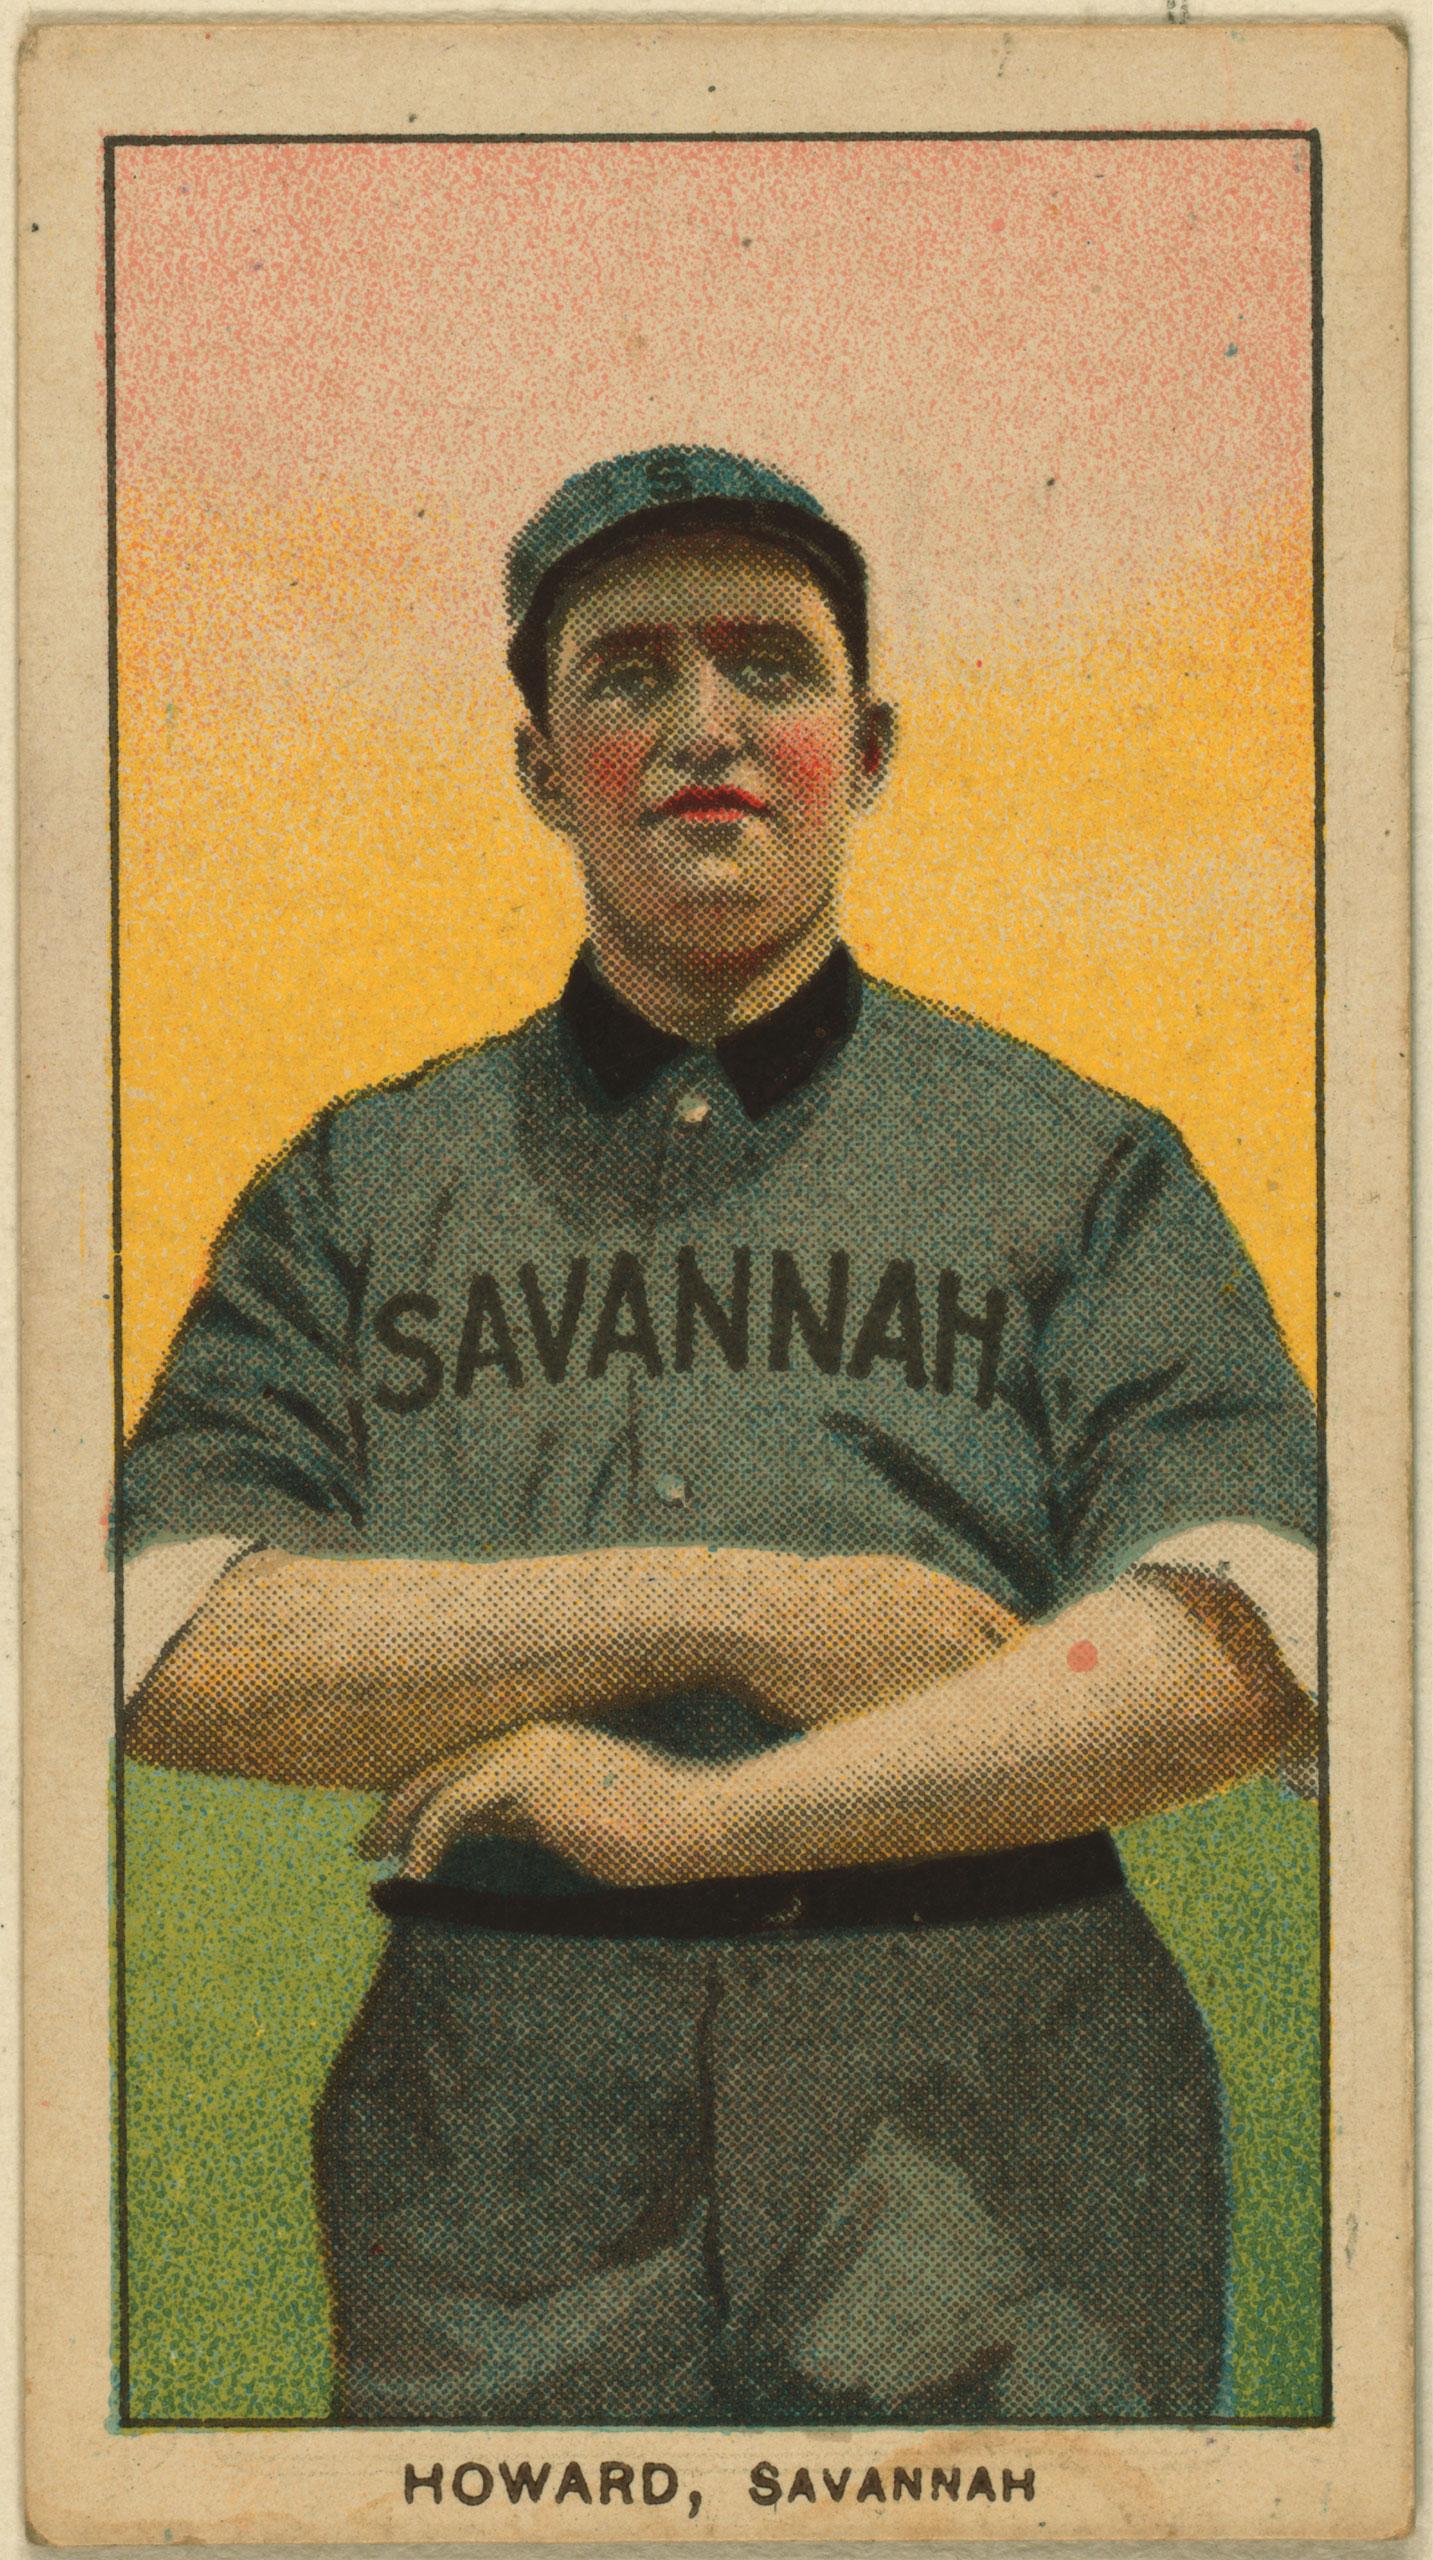 Ernie Howard, Savannah Team, baseball card, 1909-1911.